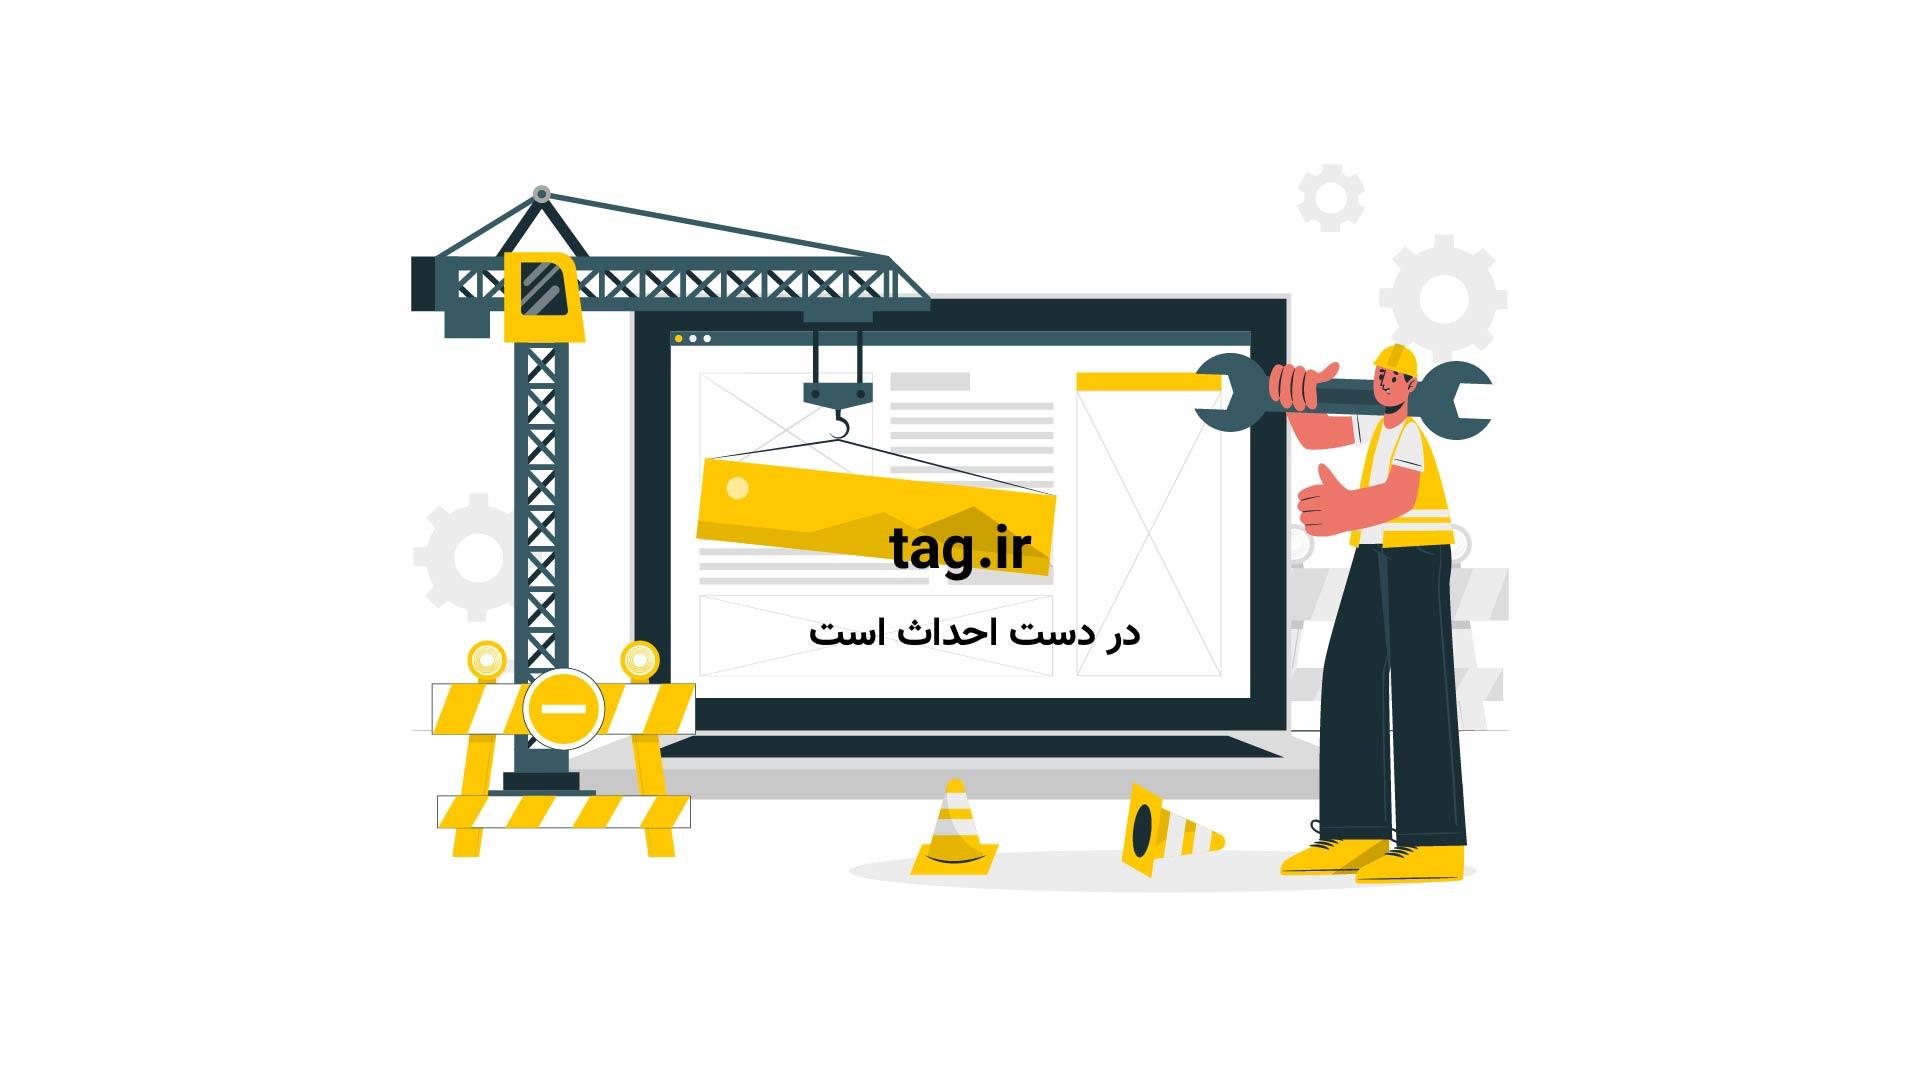 صحبتهای خسرو حیدری درباره اوضاع مالیاش   فیلم